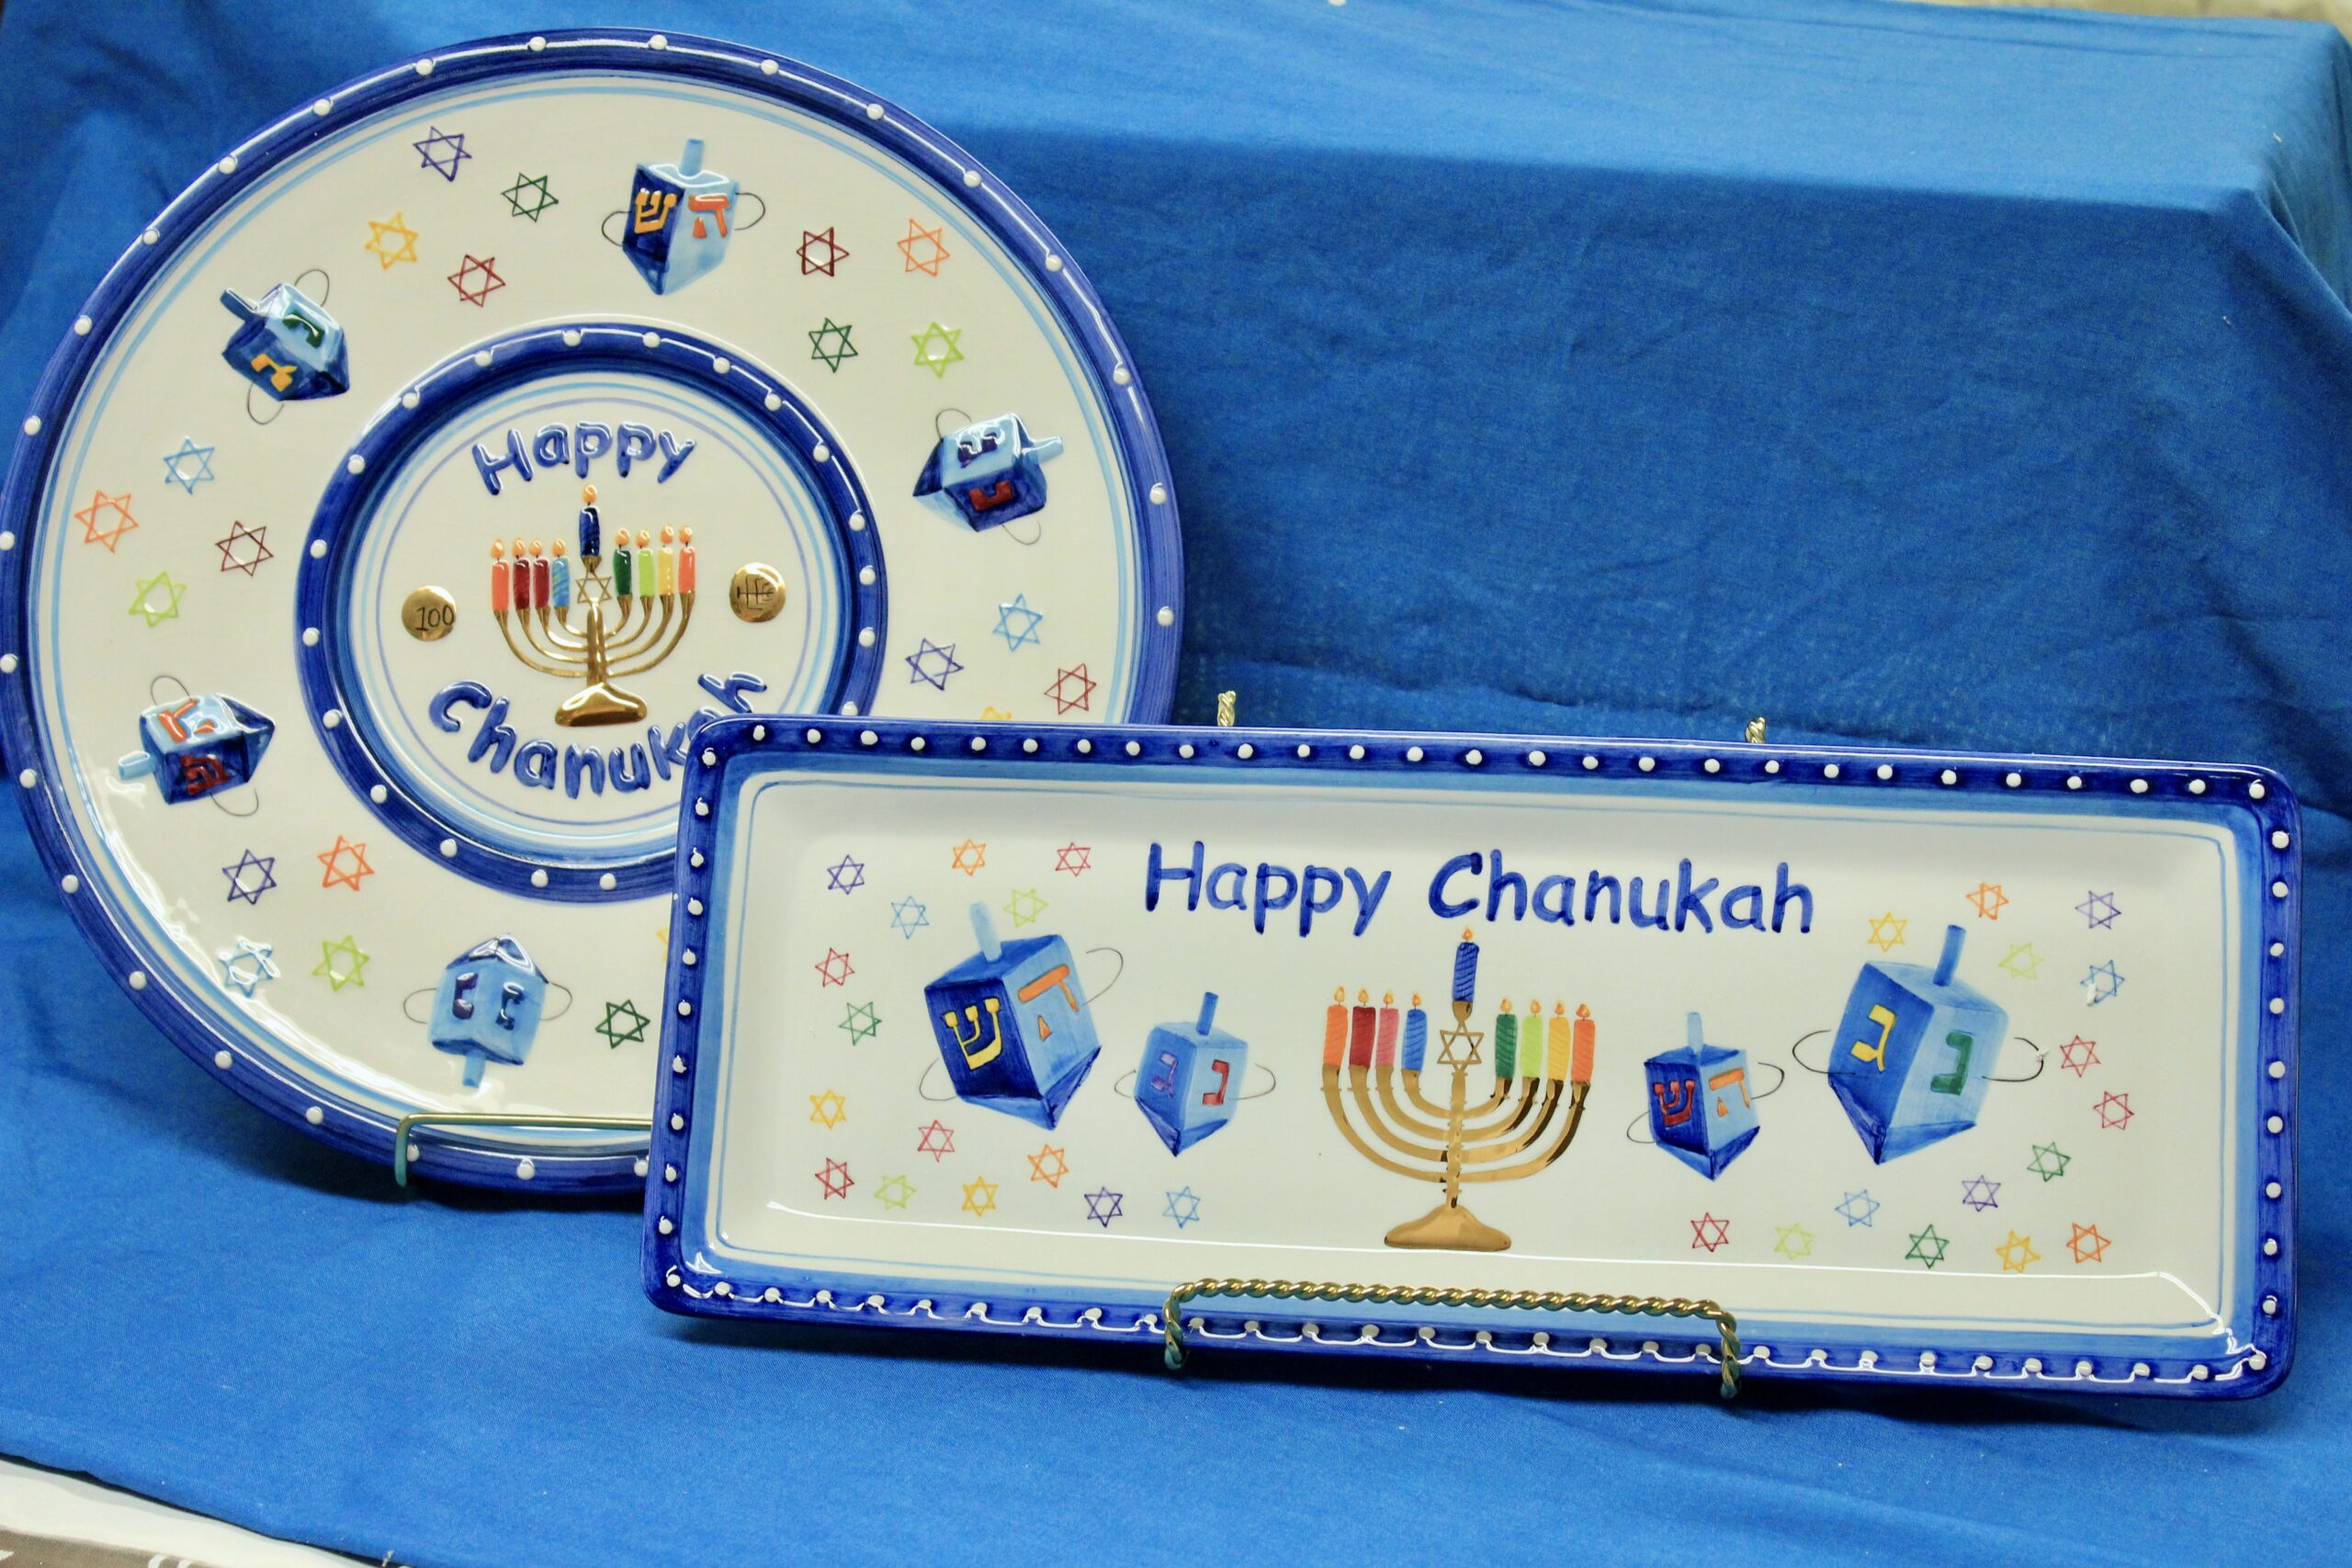 Hanukkah Platter and Tray Set $35